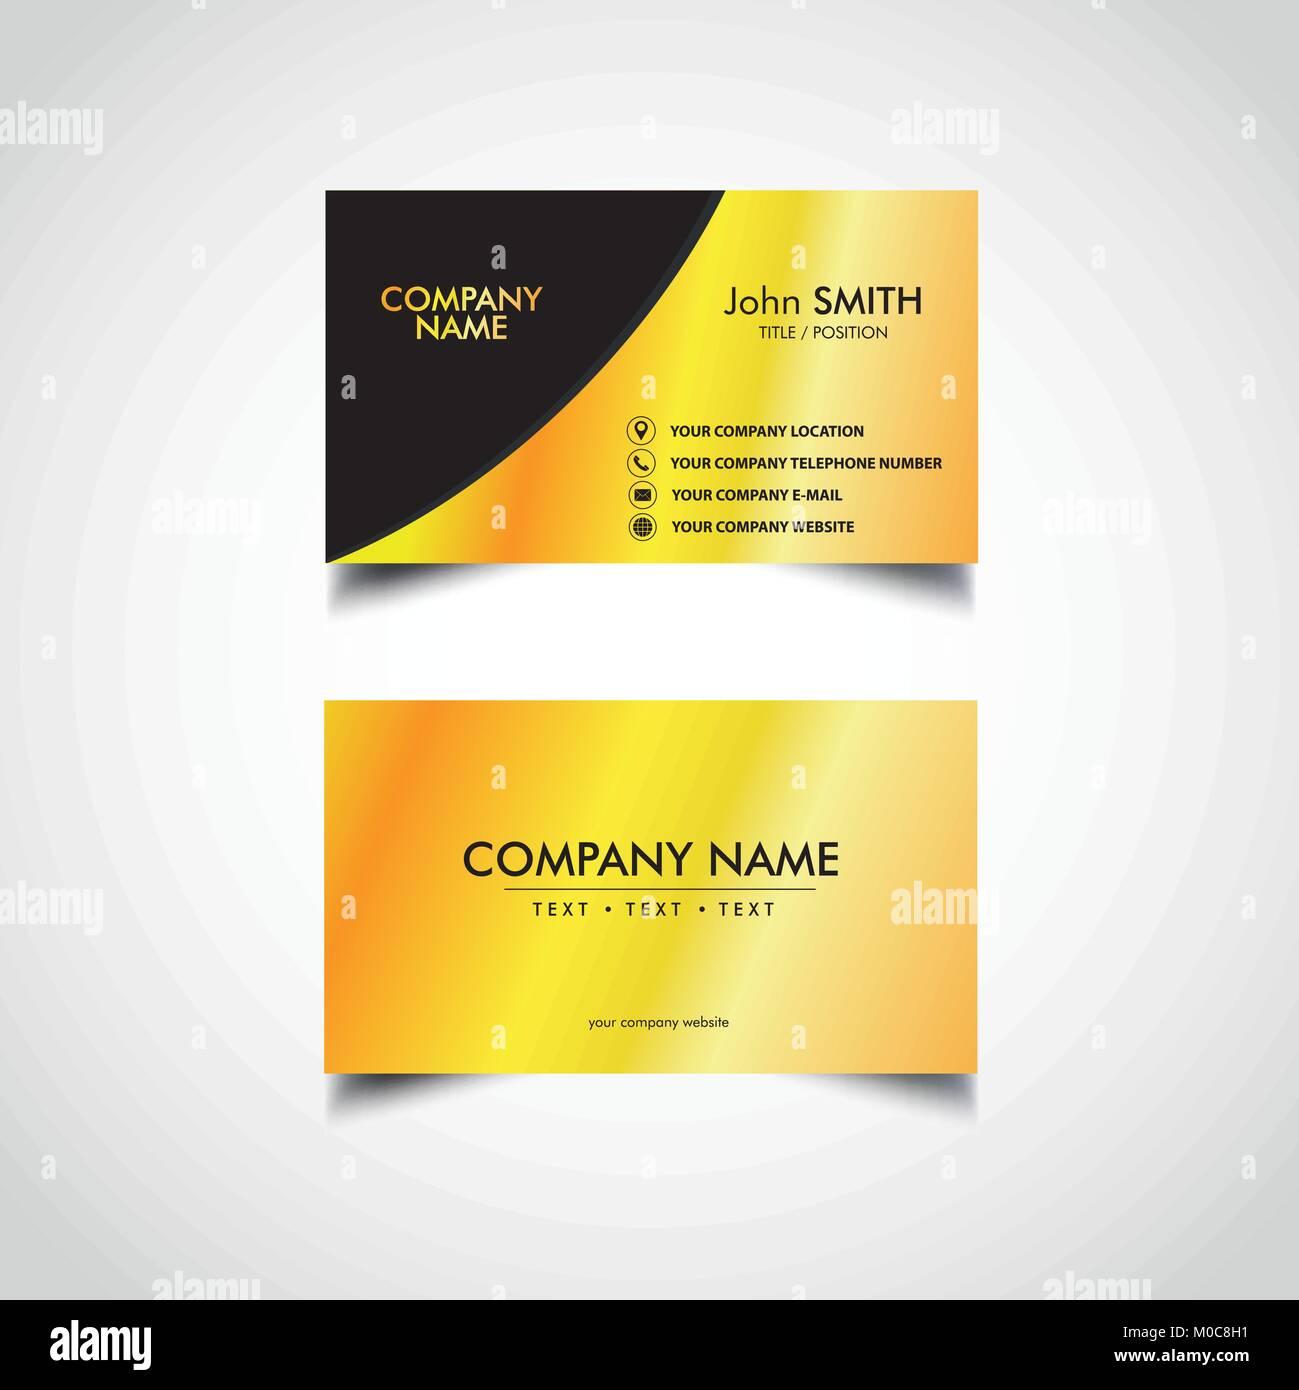 Golden Business Card Template Vector Illustration Eps File Stock